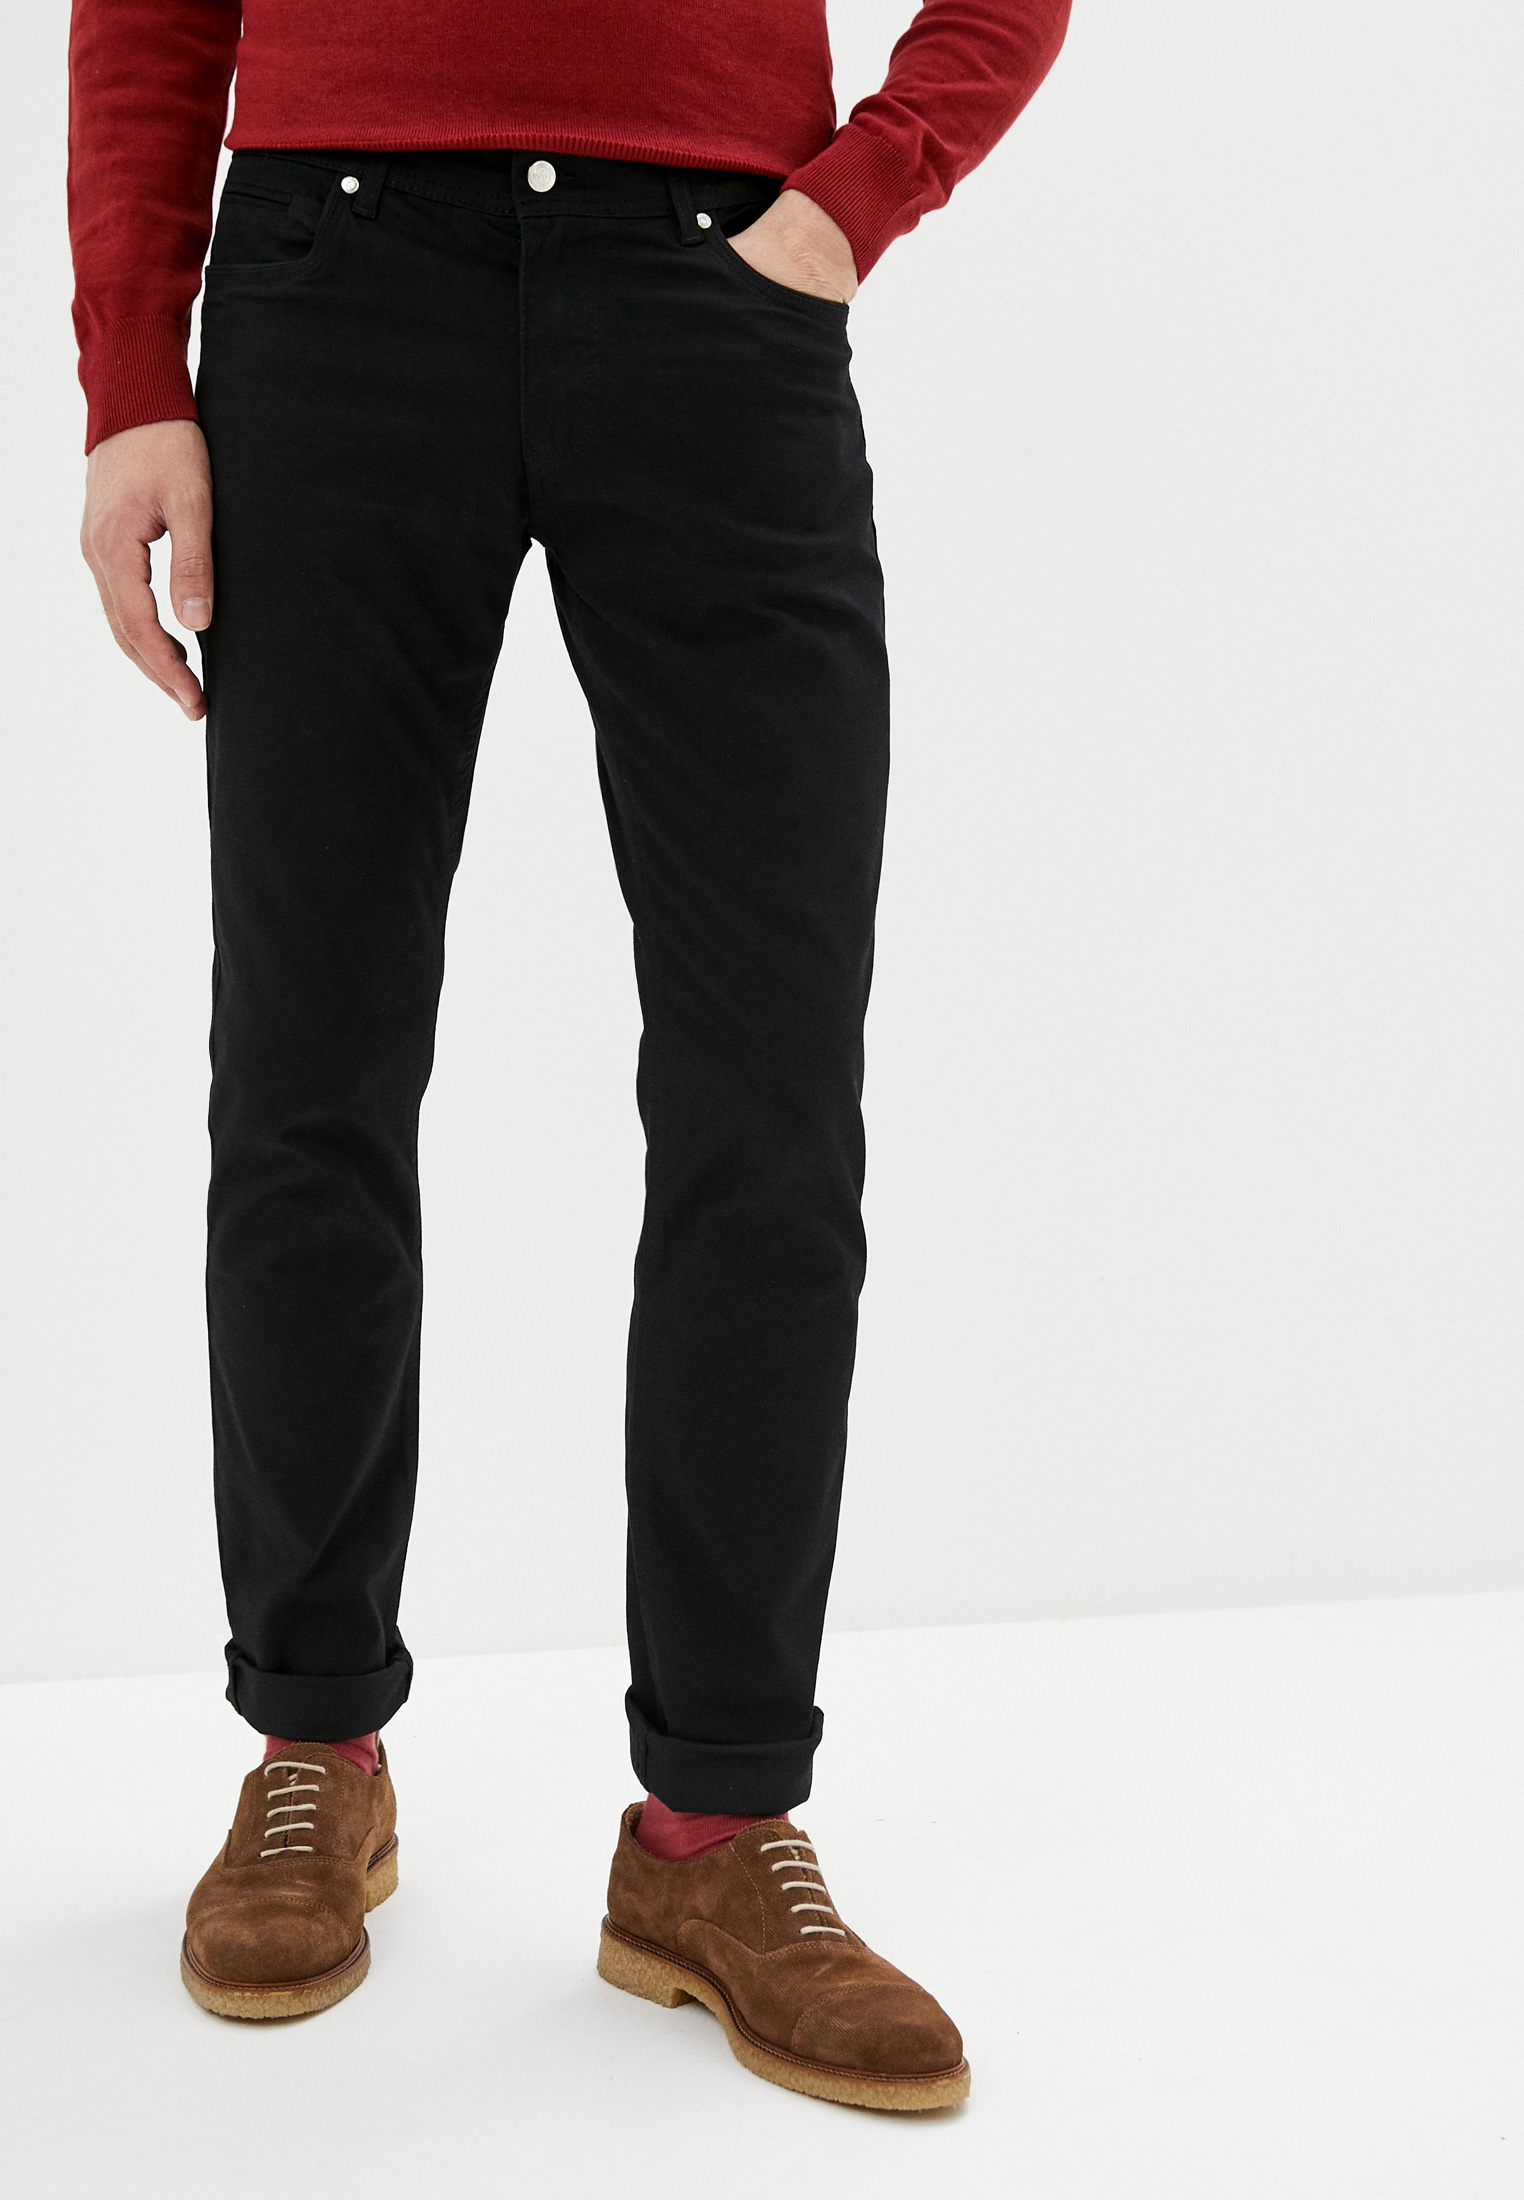 Мужские повседневные брюки JIMMY SANDERS (Джимми Сандерс) 19W PM11002 BLACK